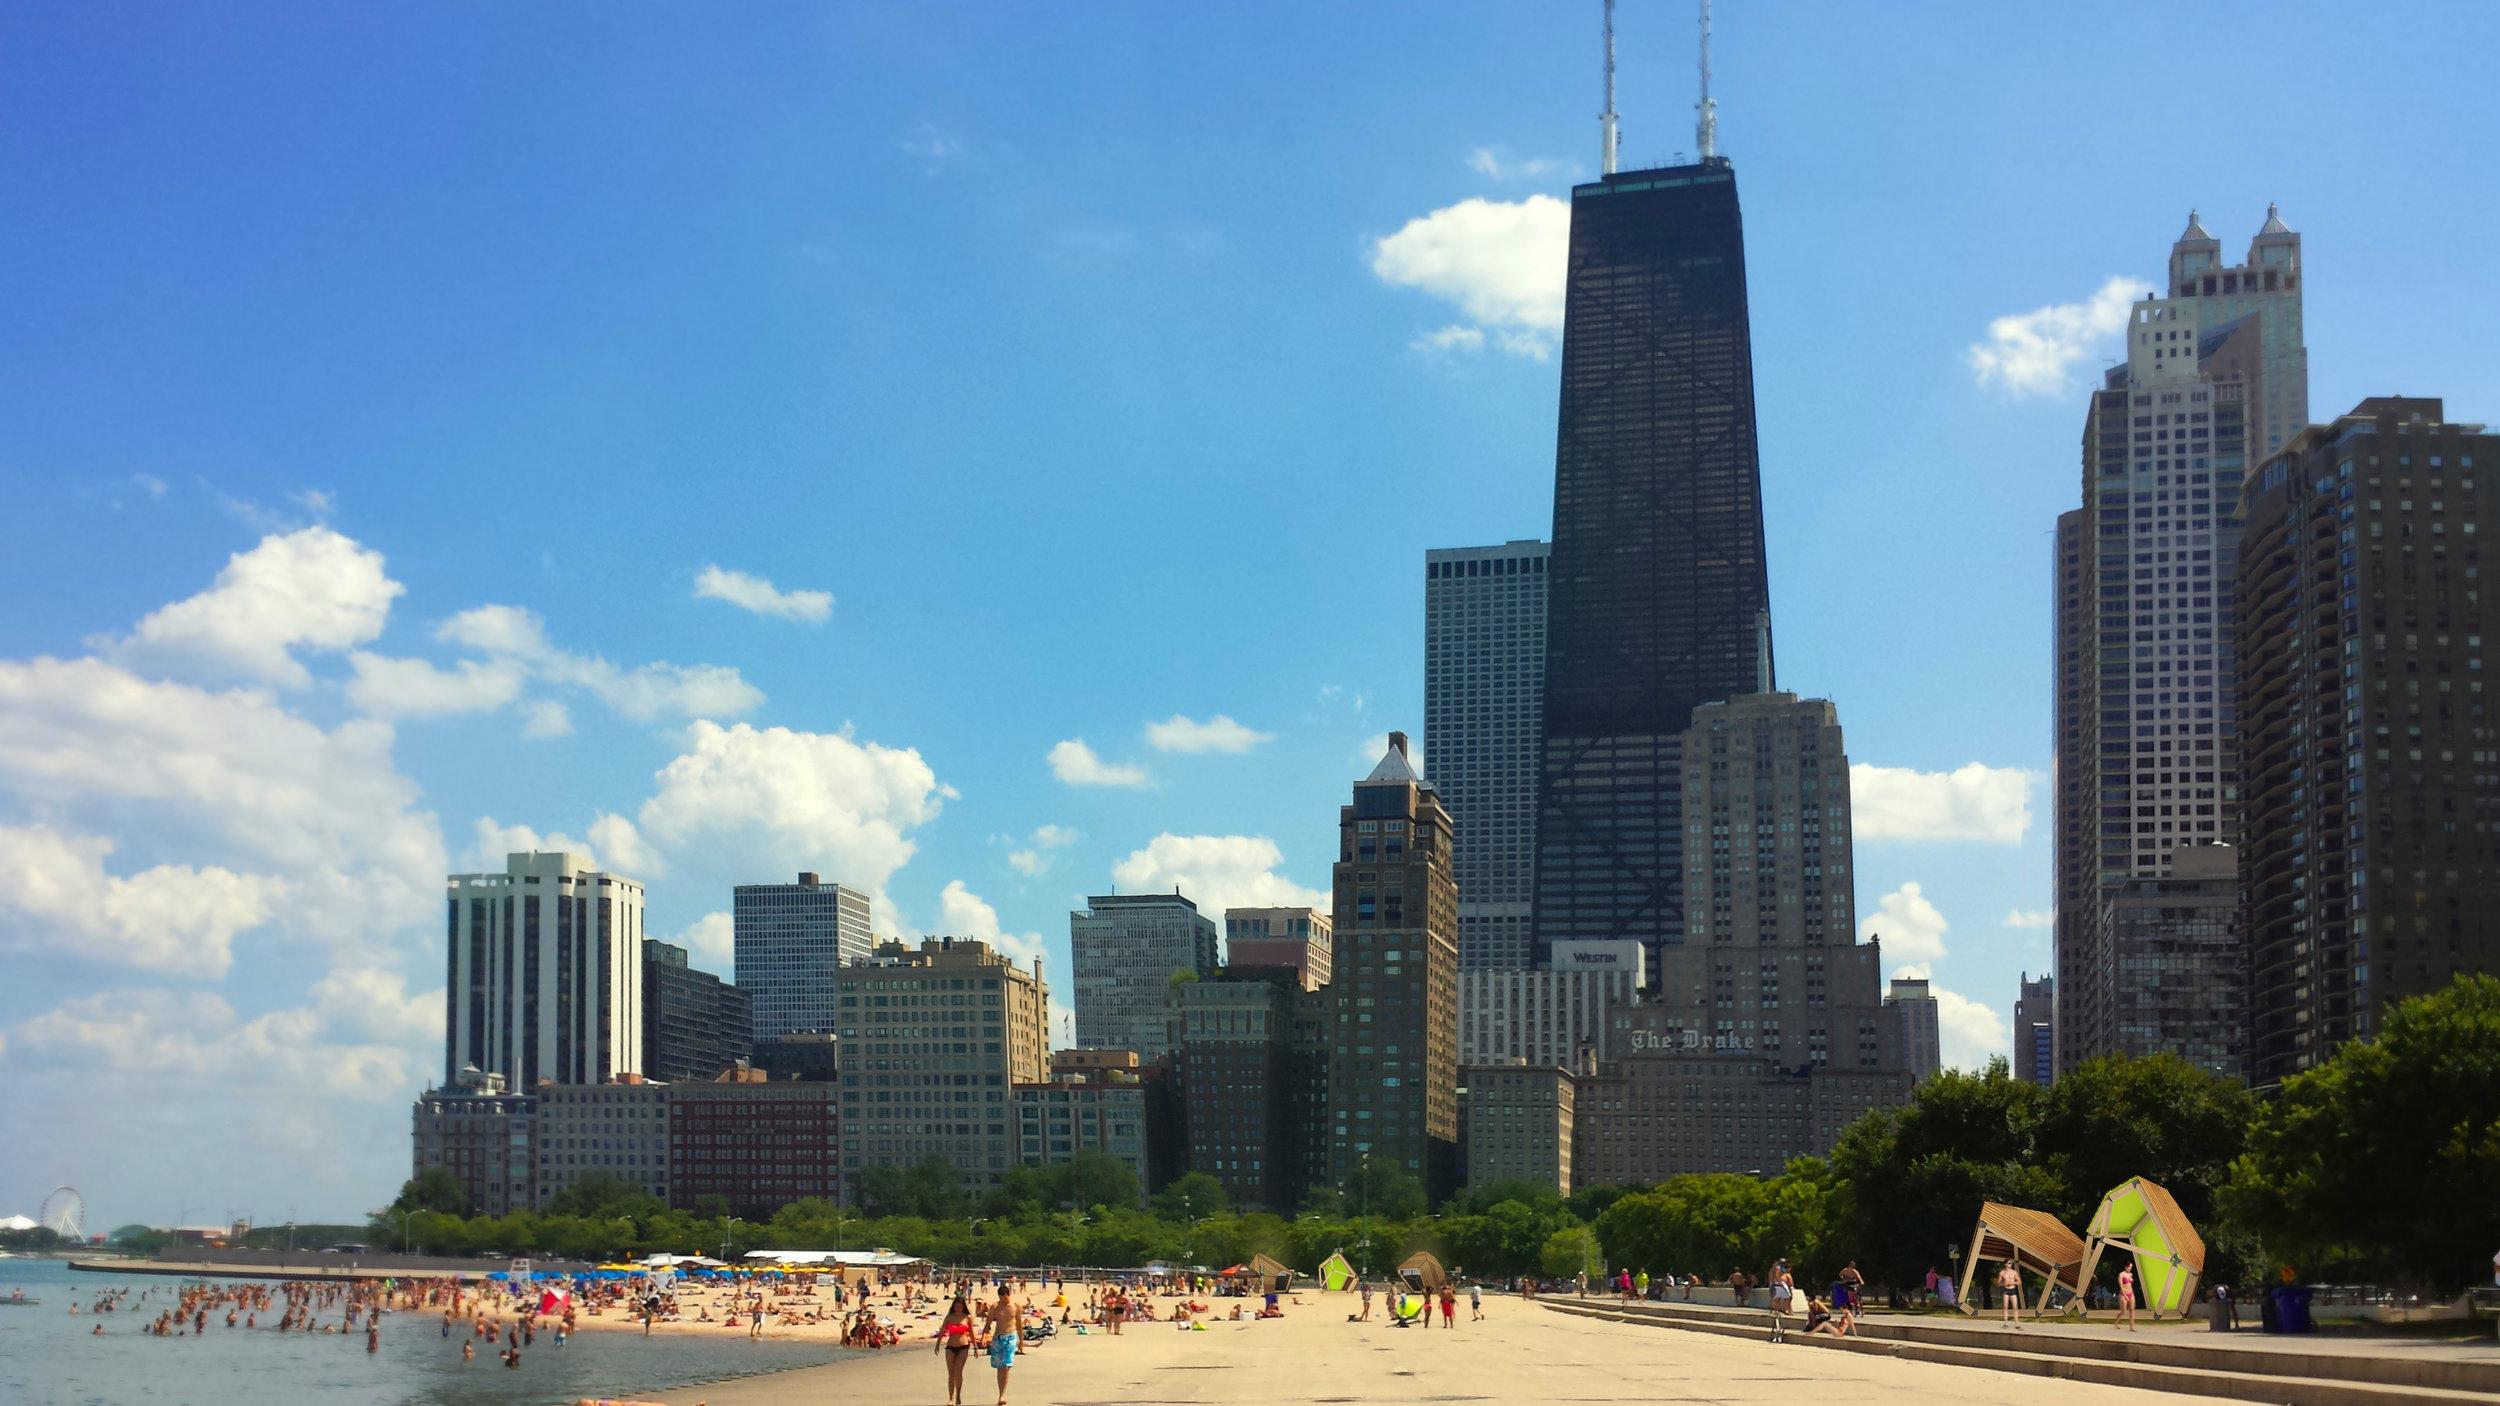 Oak_Street_Beach_Chicago_01.jpg